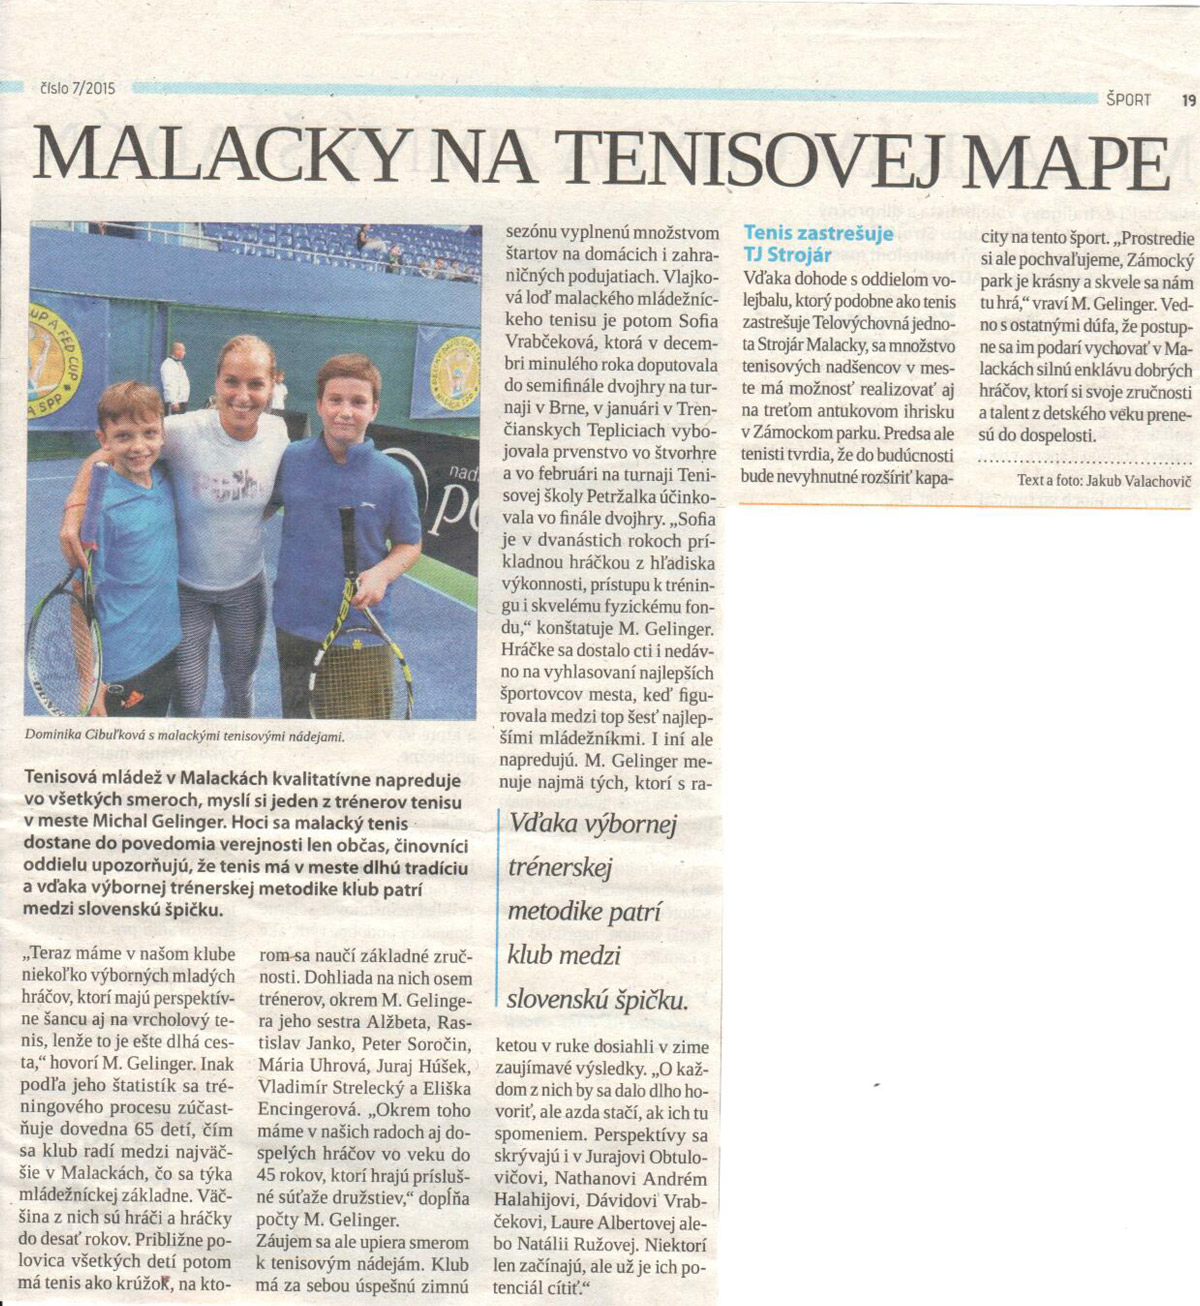 TENIS MALACKY - TJ Strojár c5e21f49b3e